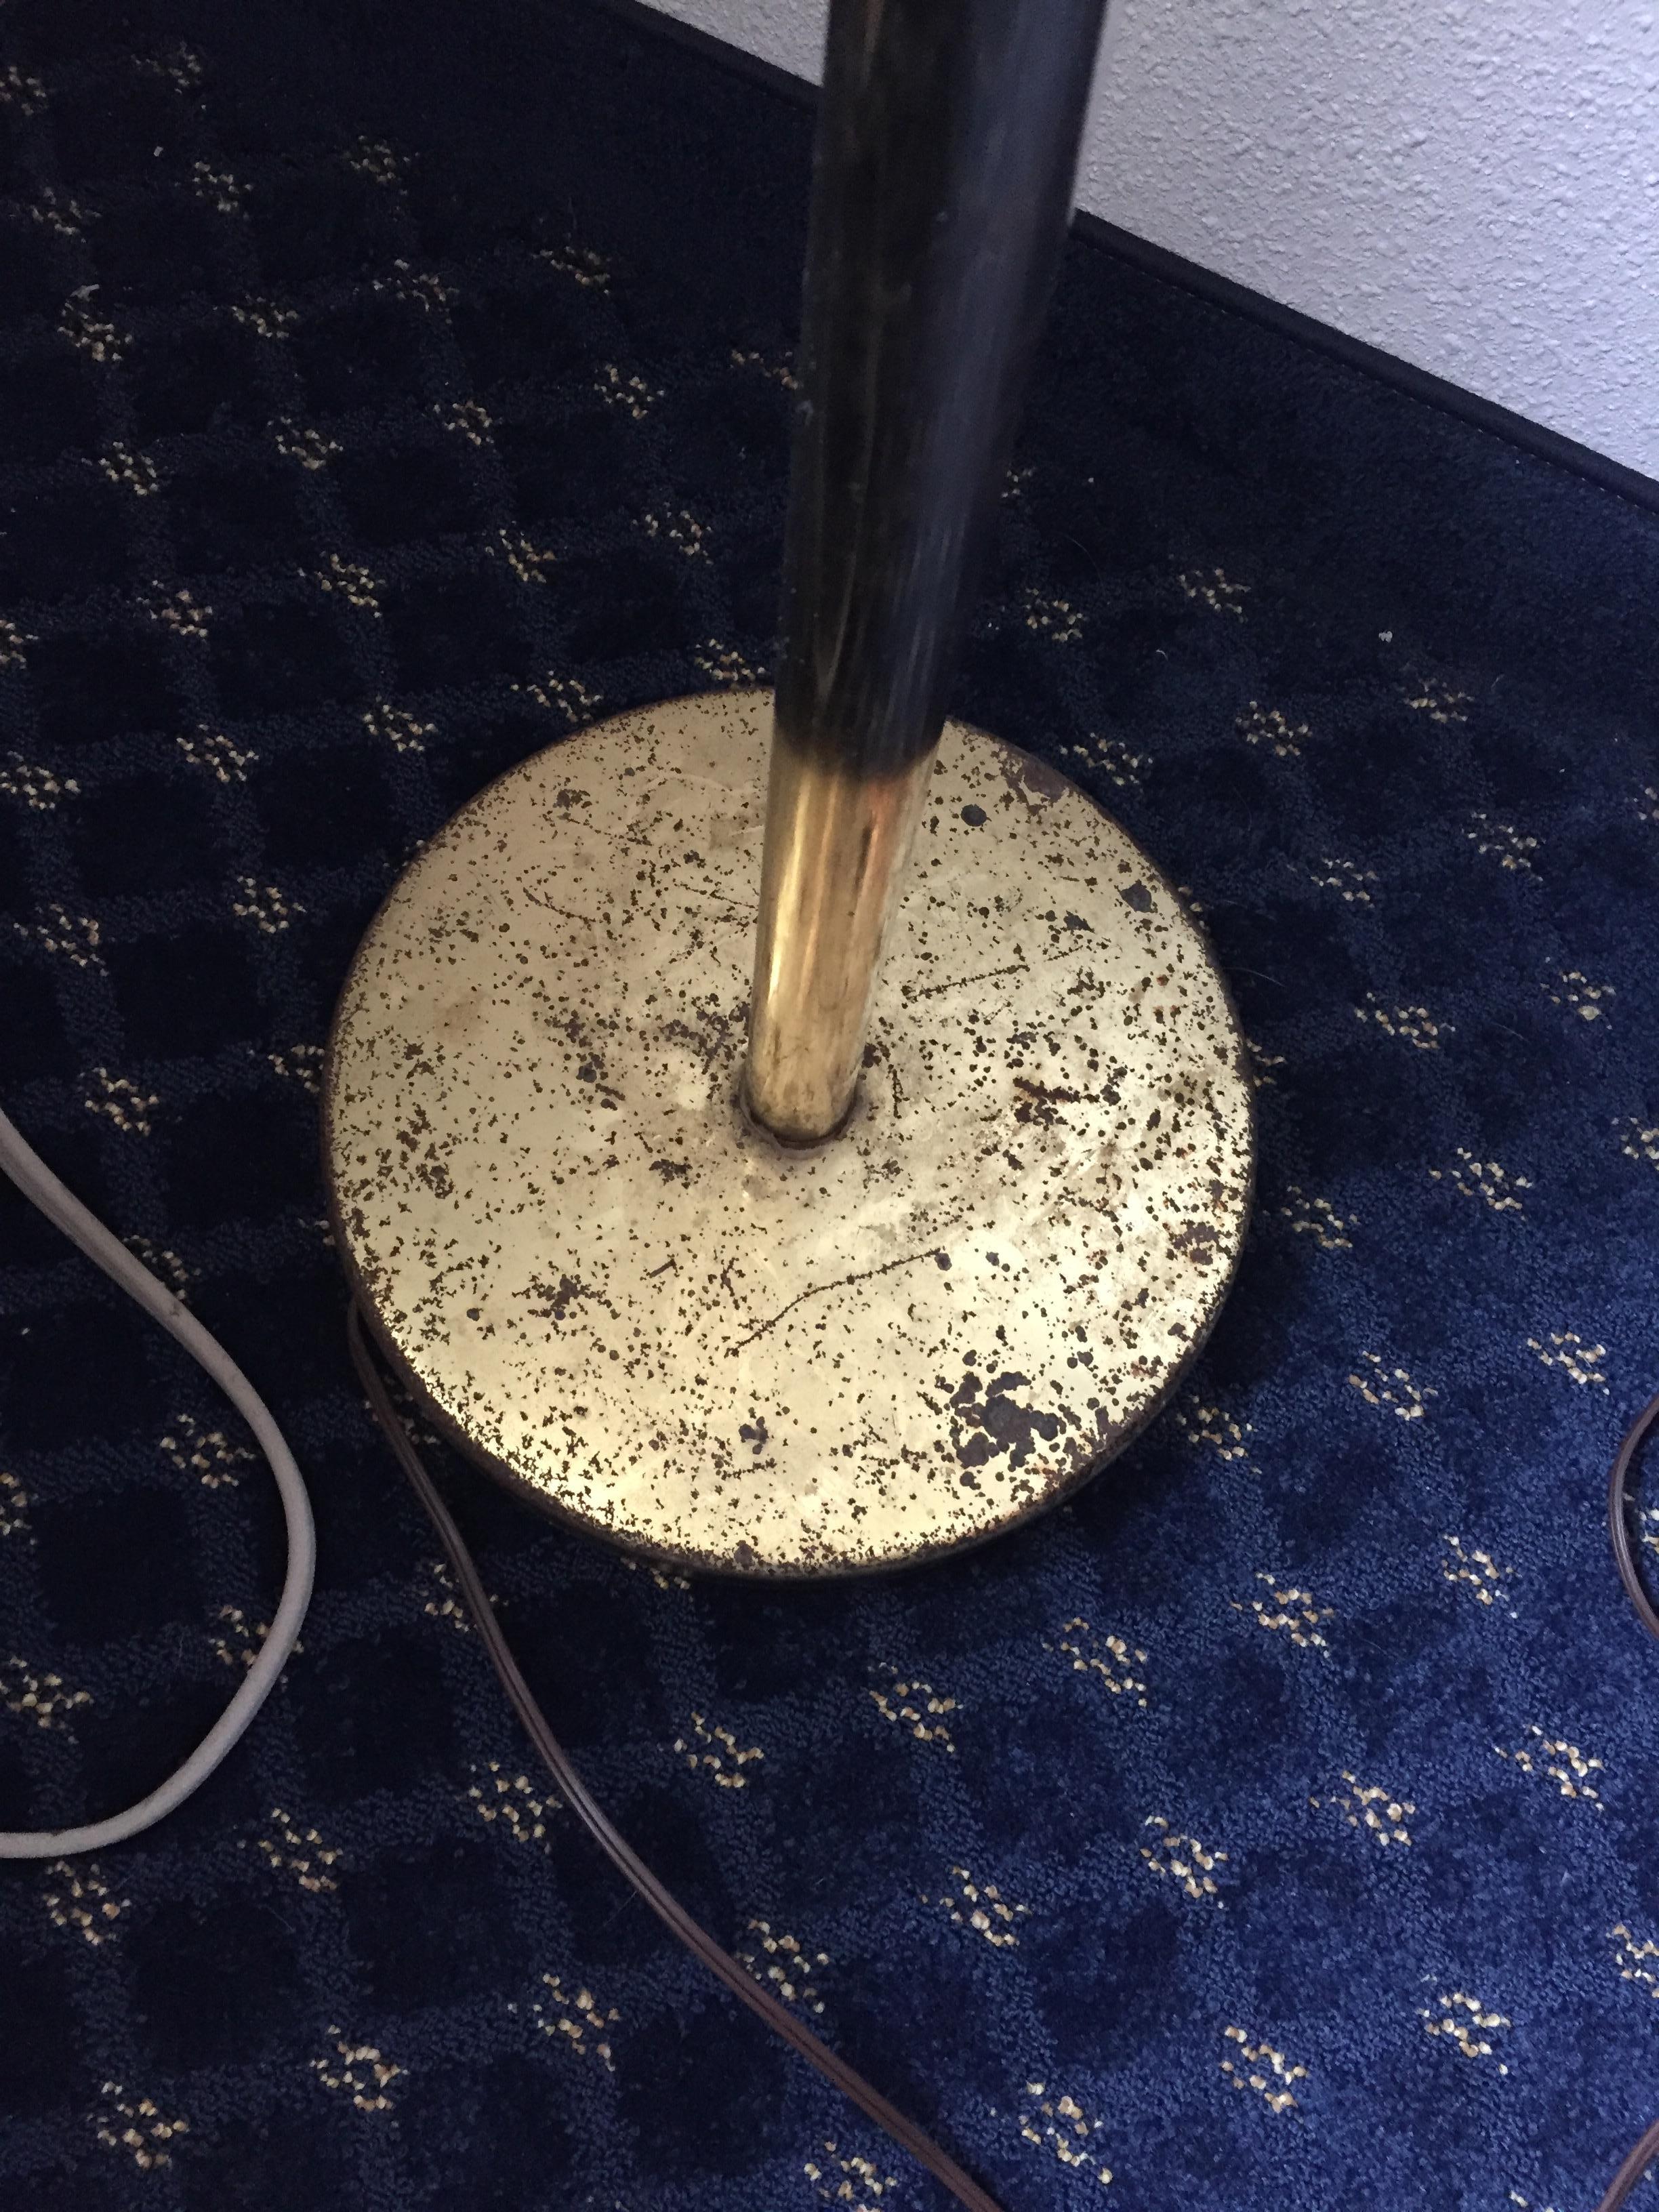 Rusty lamp did not work